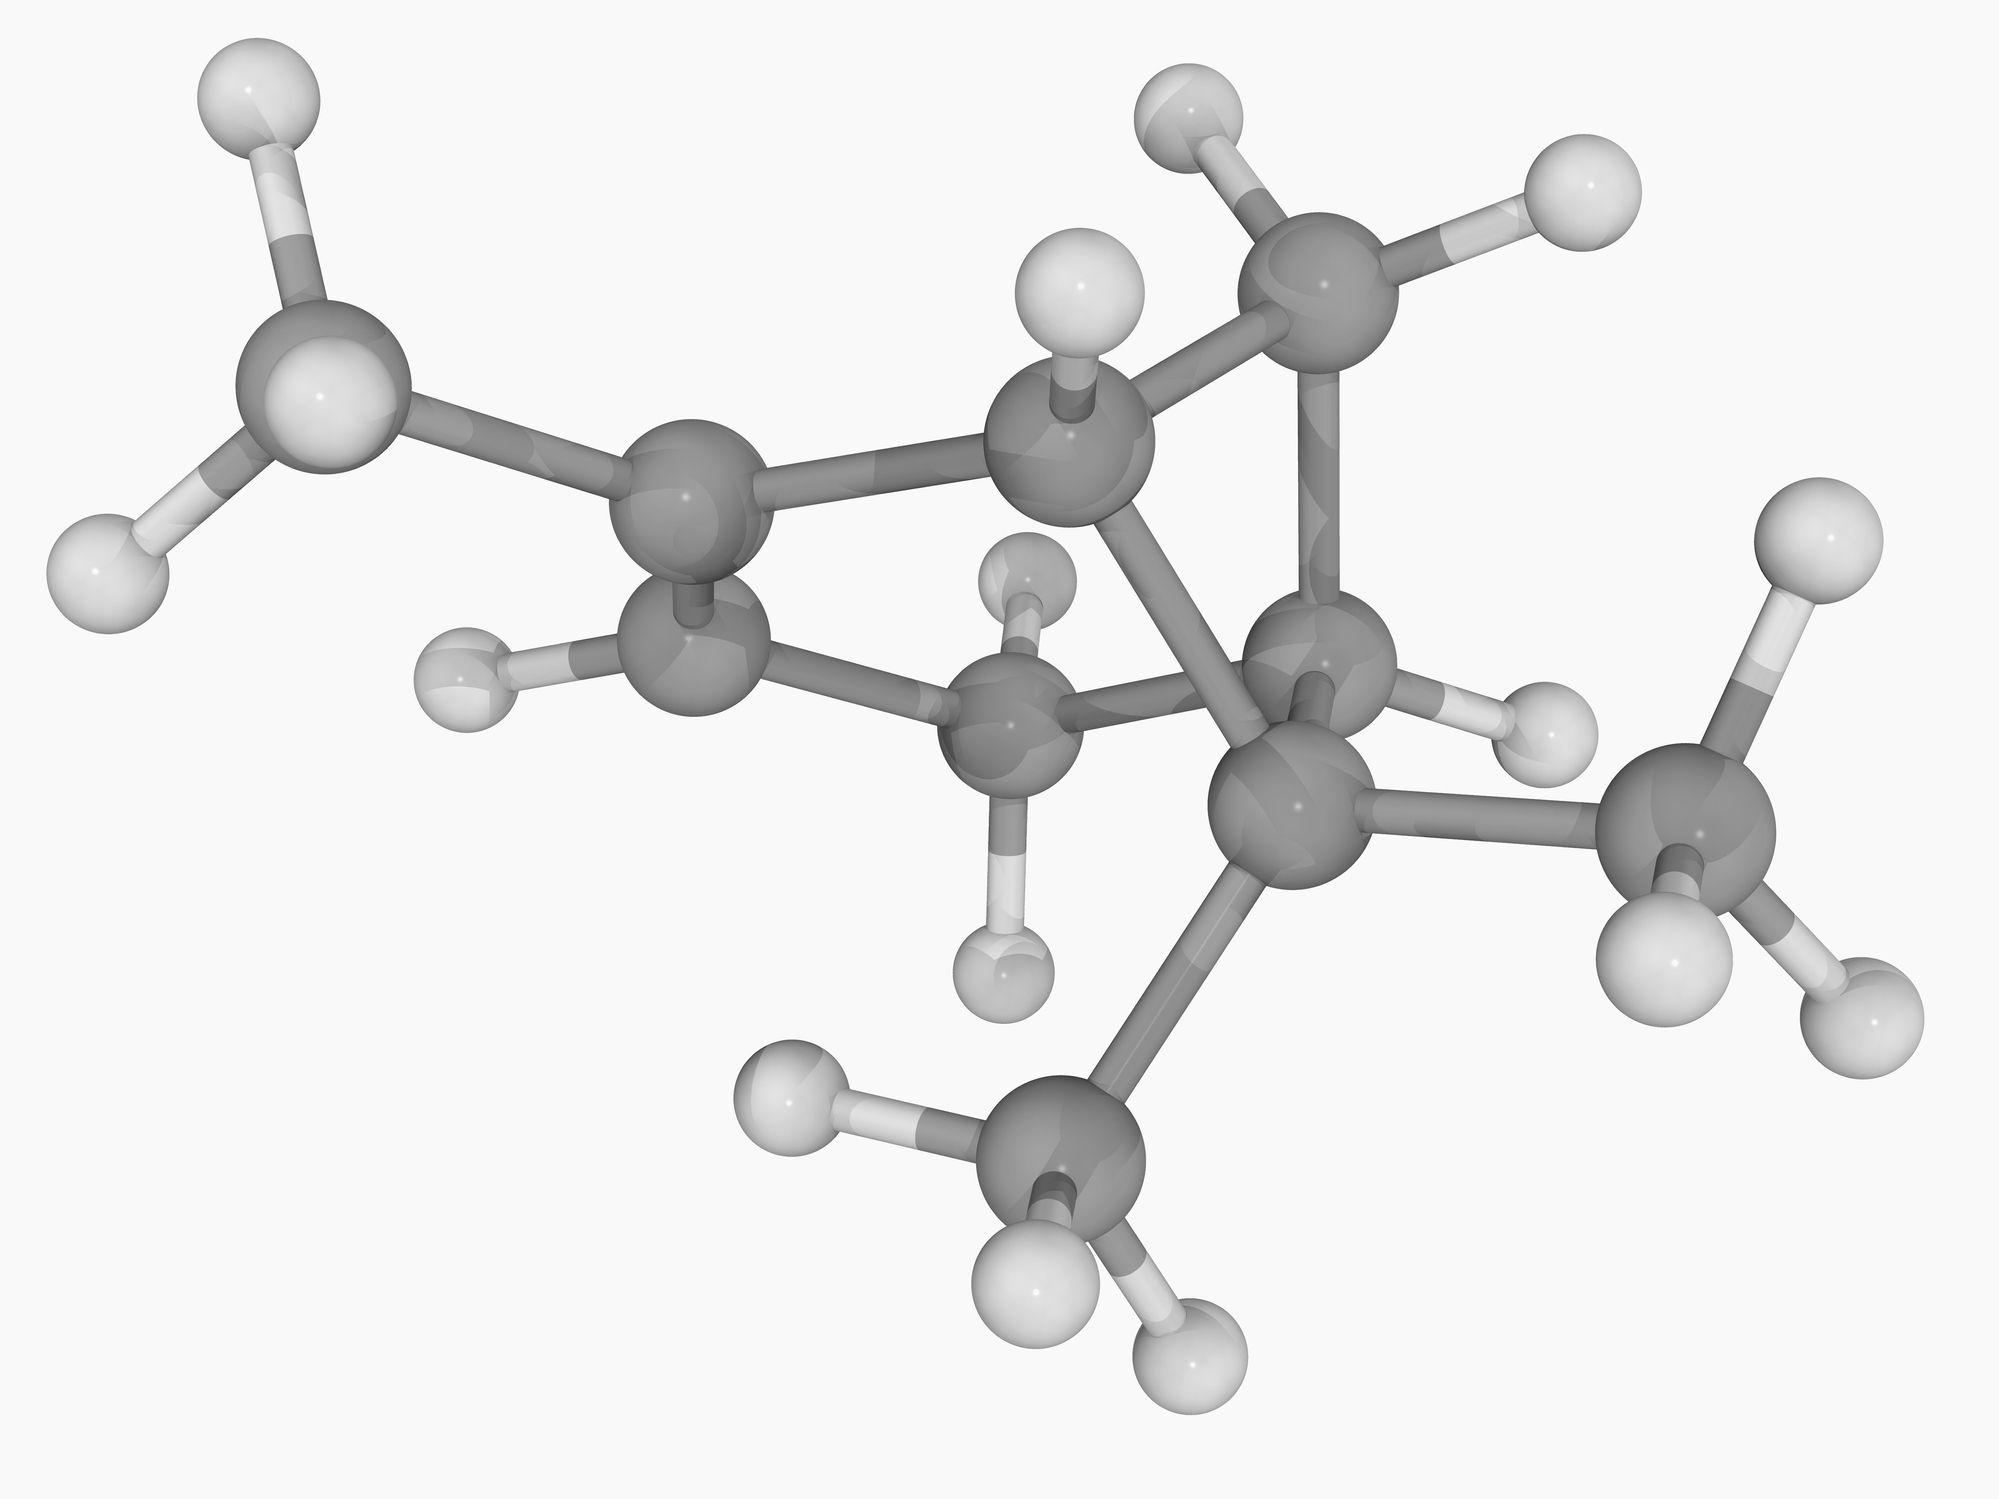 alpha-pinene molecule